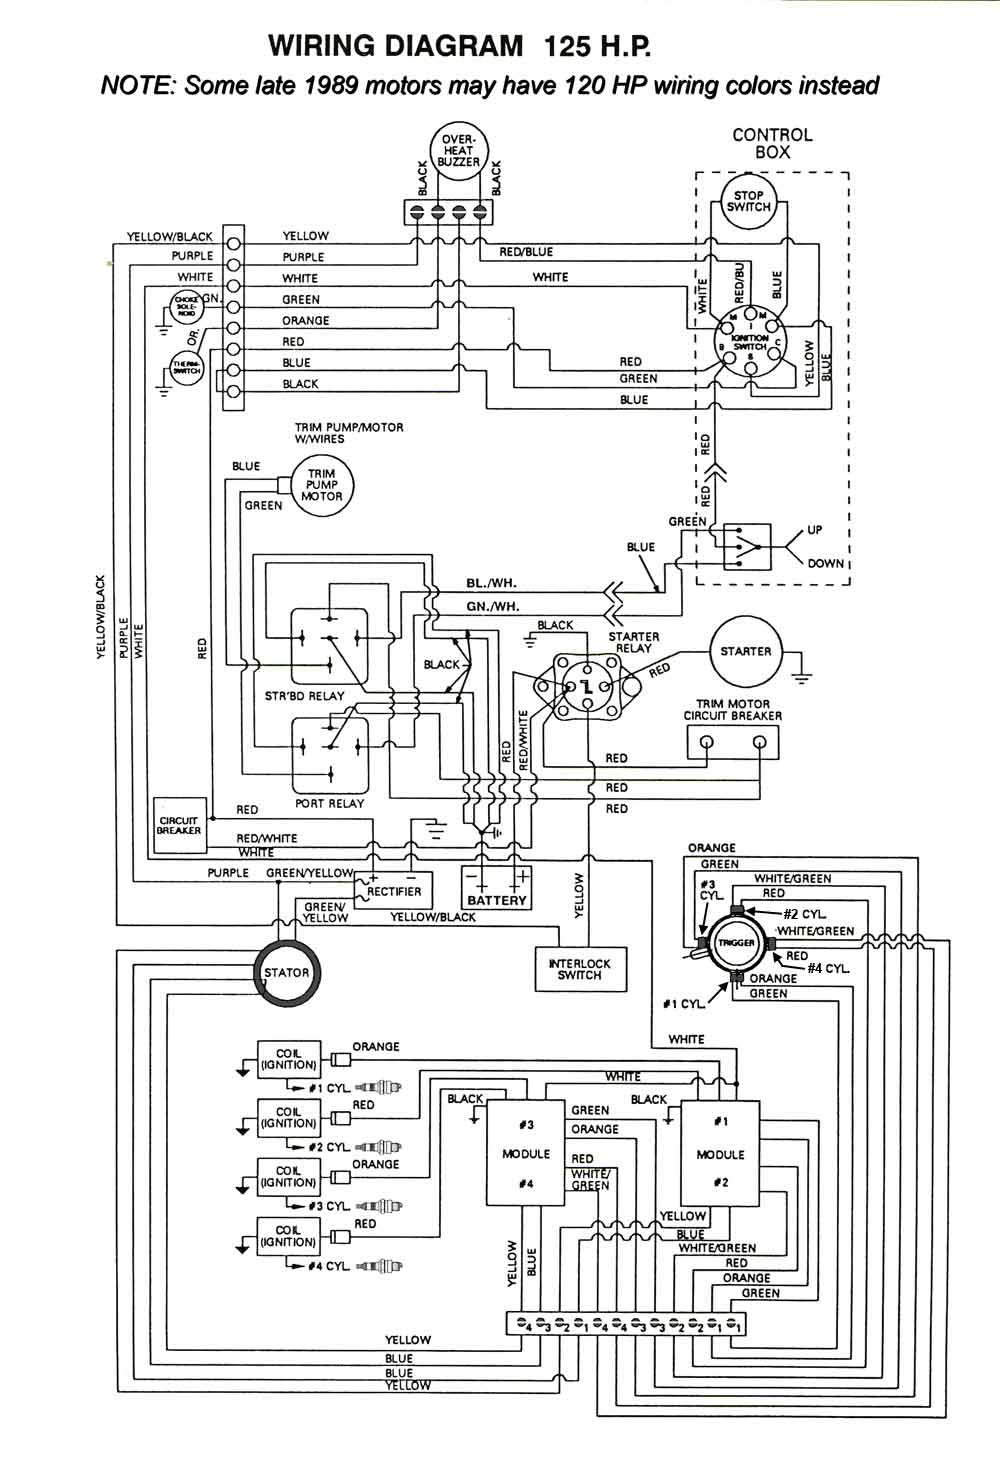 medium resolution of  125hp thru89 eng mastertech marine chrysler force outboard wiring diagrams at cita asia